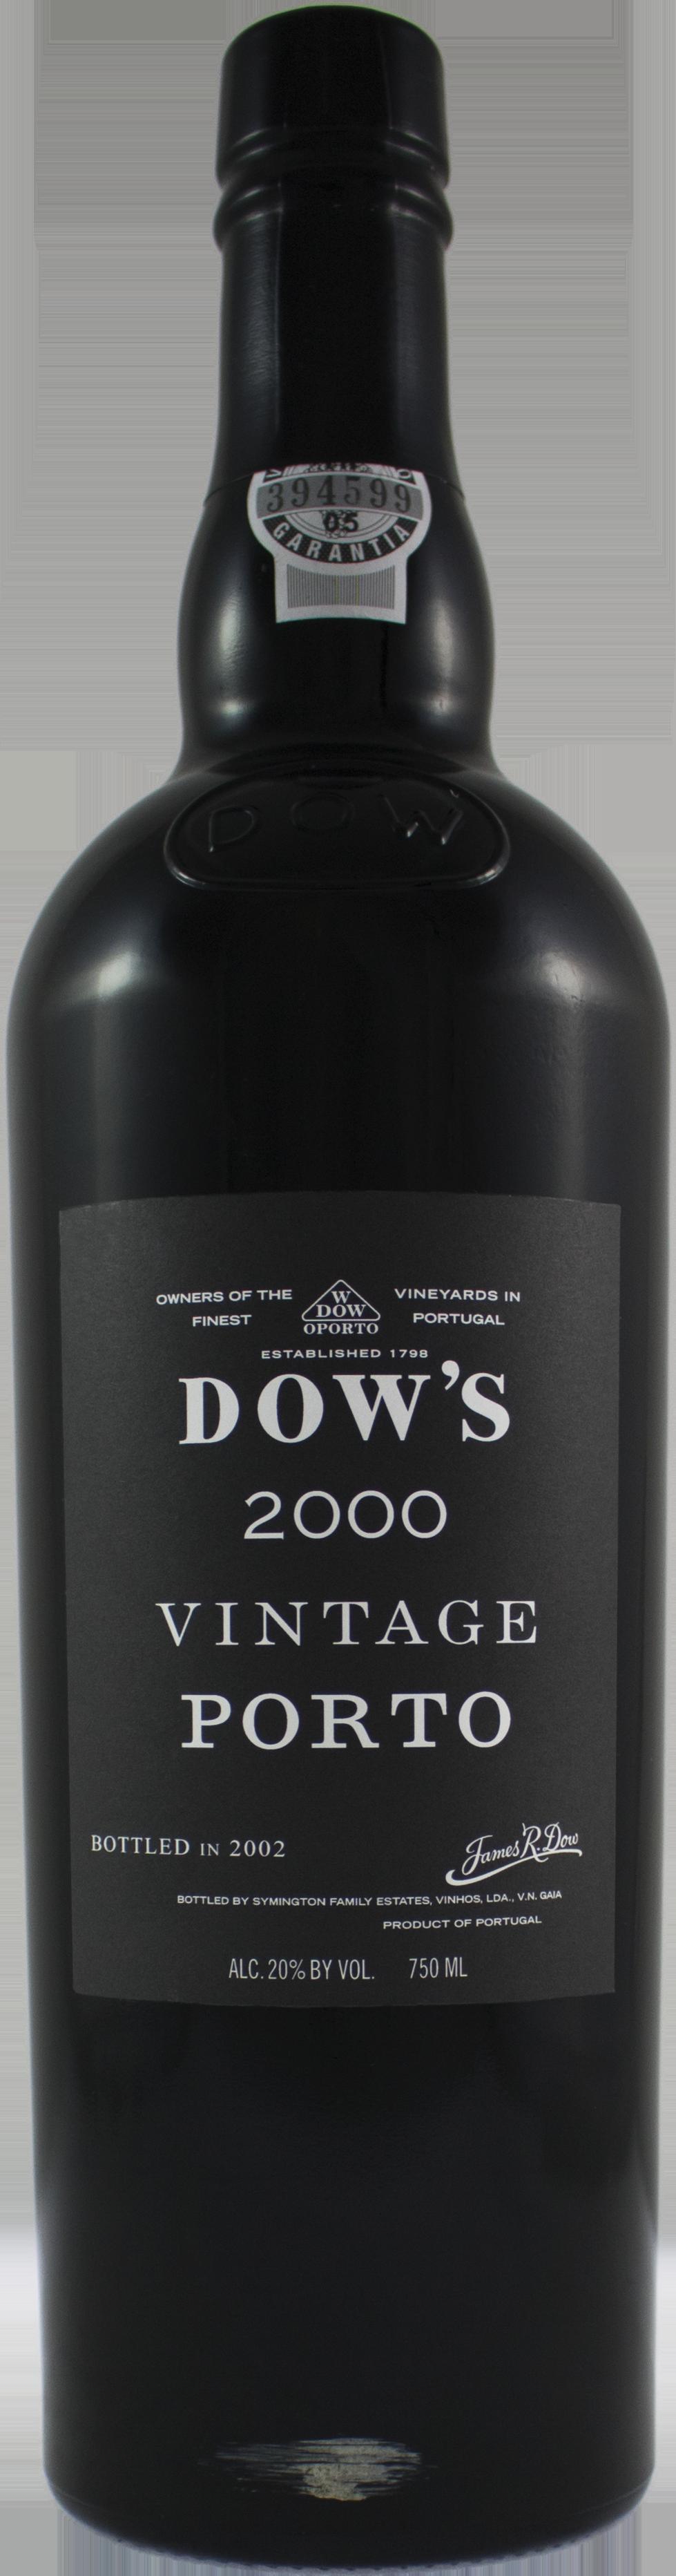 dow vintage port 2000